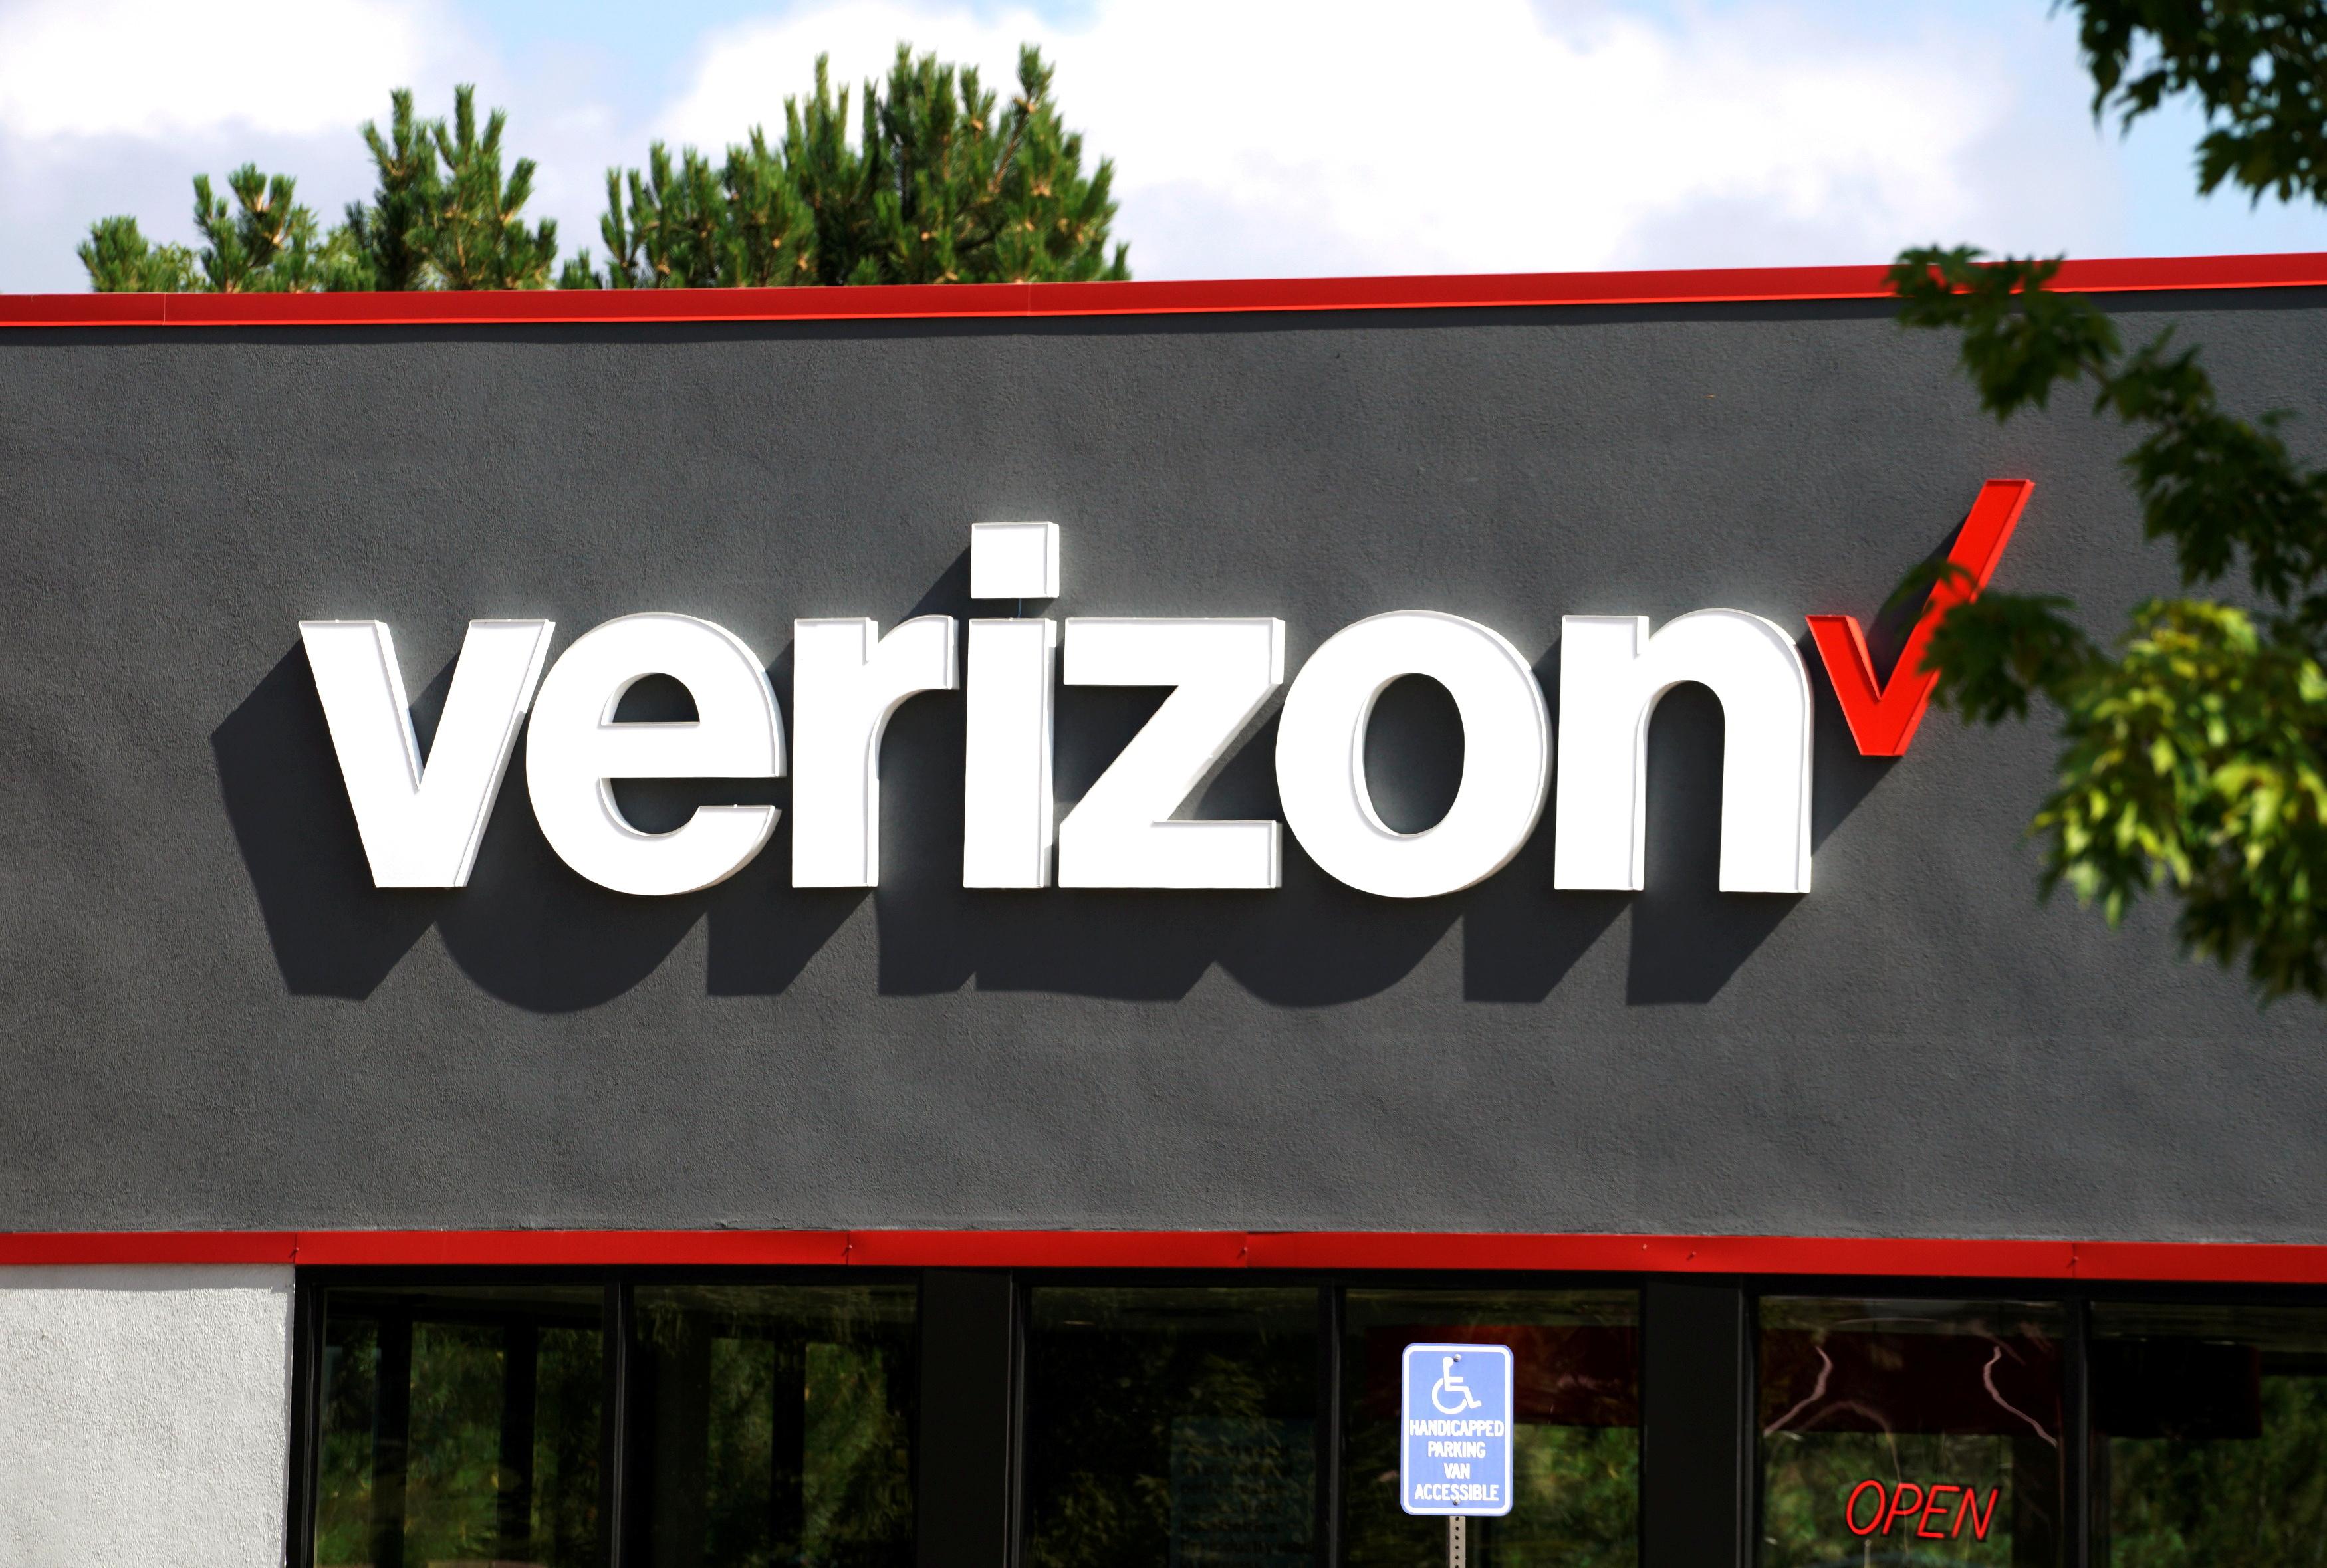 A Verizon store in Superior, Colorado, U.S., July 27, 2017.  REUTERS/Rick Wilking/File Photo